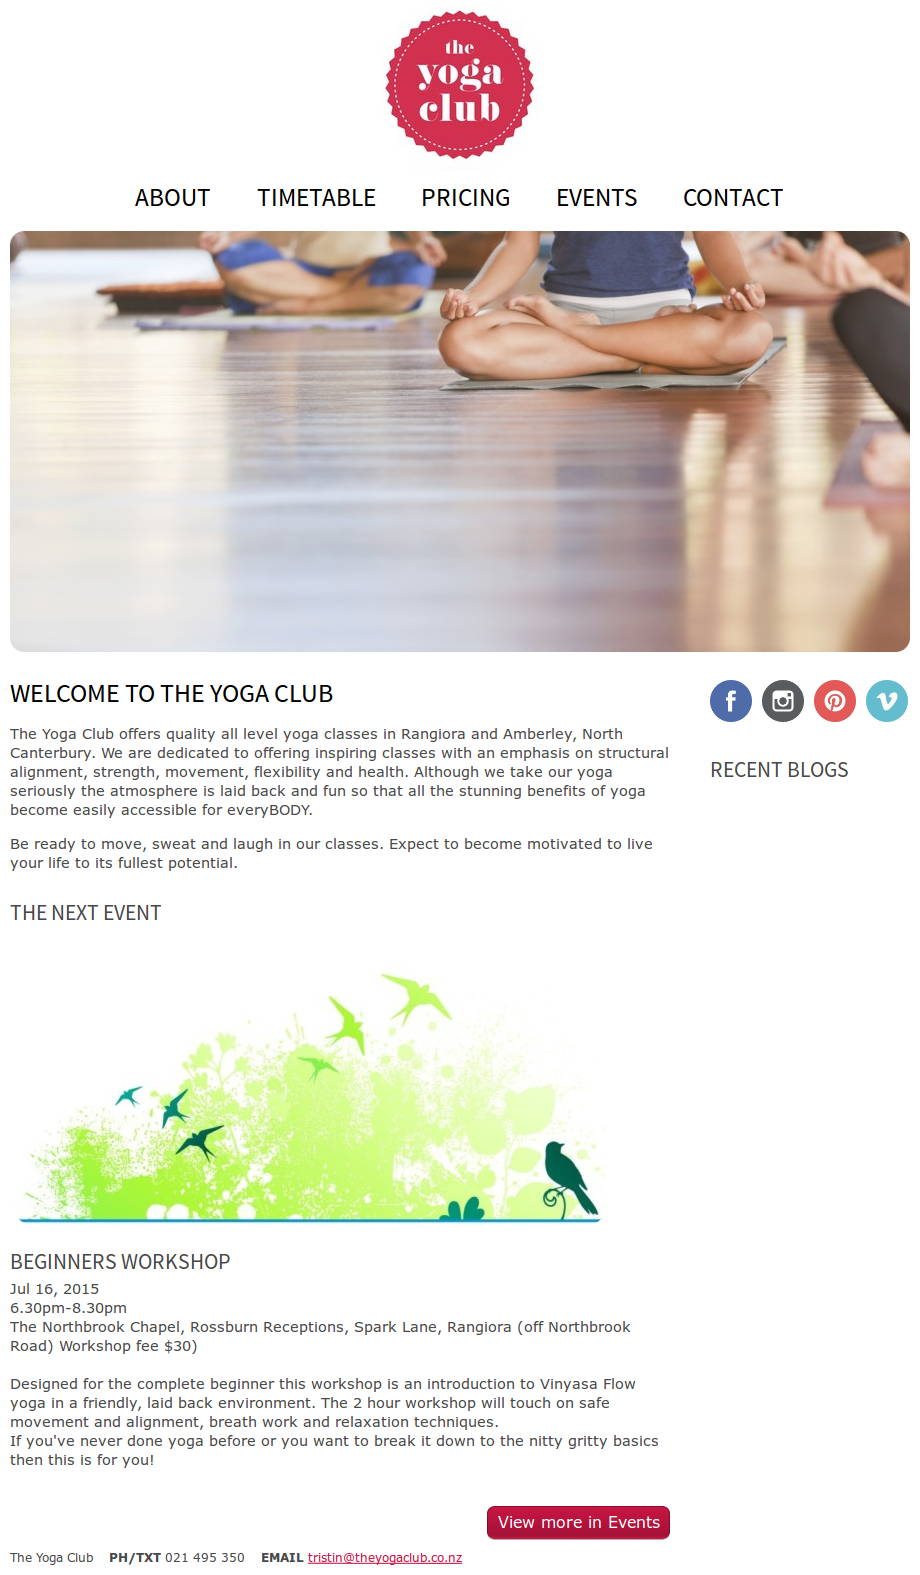 The Yoga Club